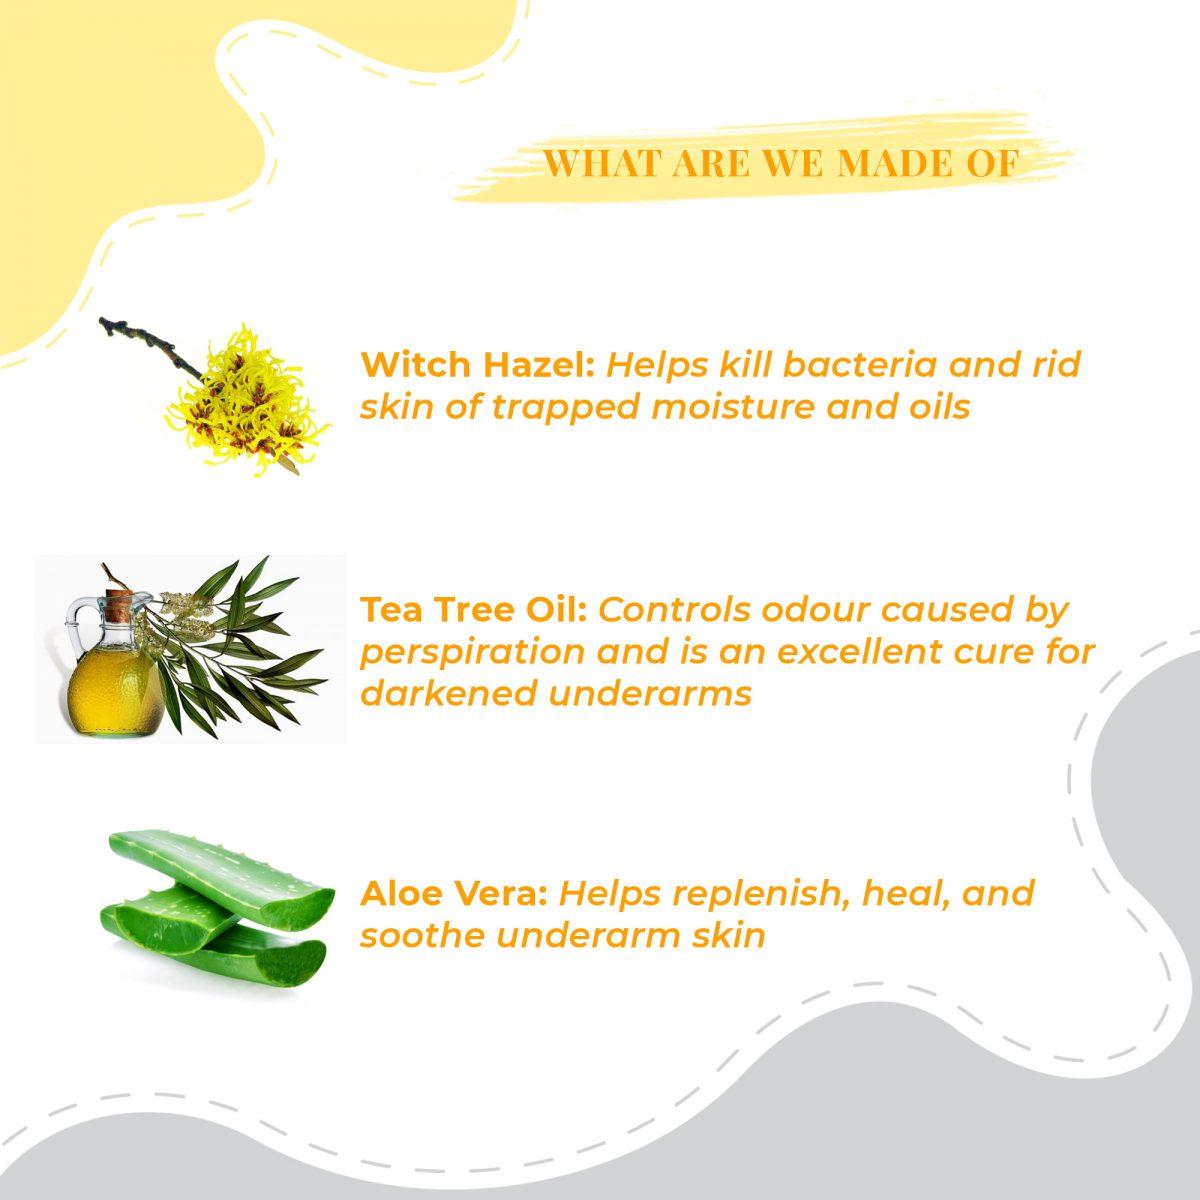 Ingredients Hurricane Deodorant | best men's deodorant for sweat | top deodorant | best men's sure deodorant | men's deodorant best male antiperspirant | spray deodorant